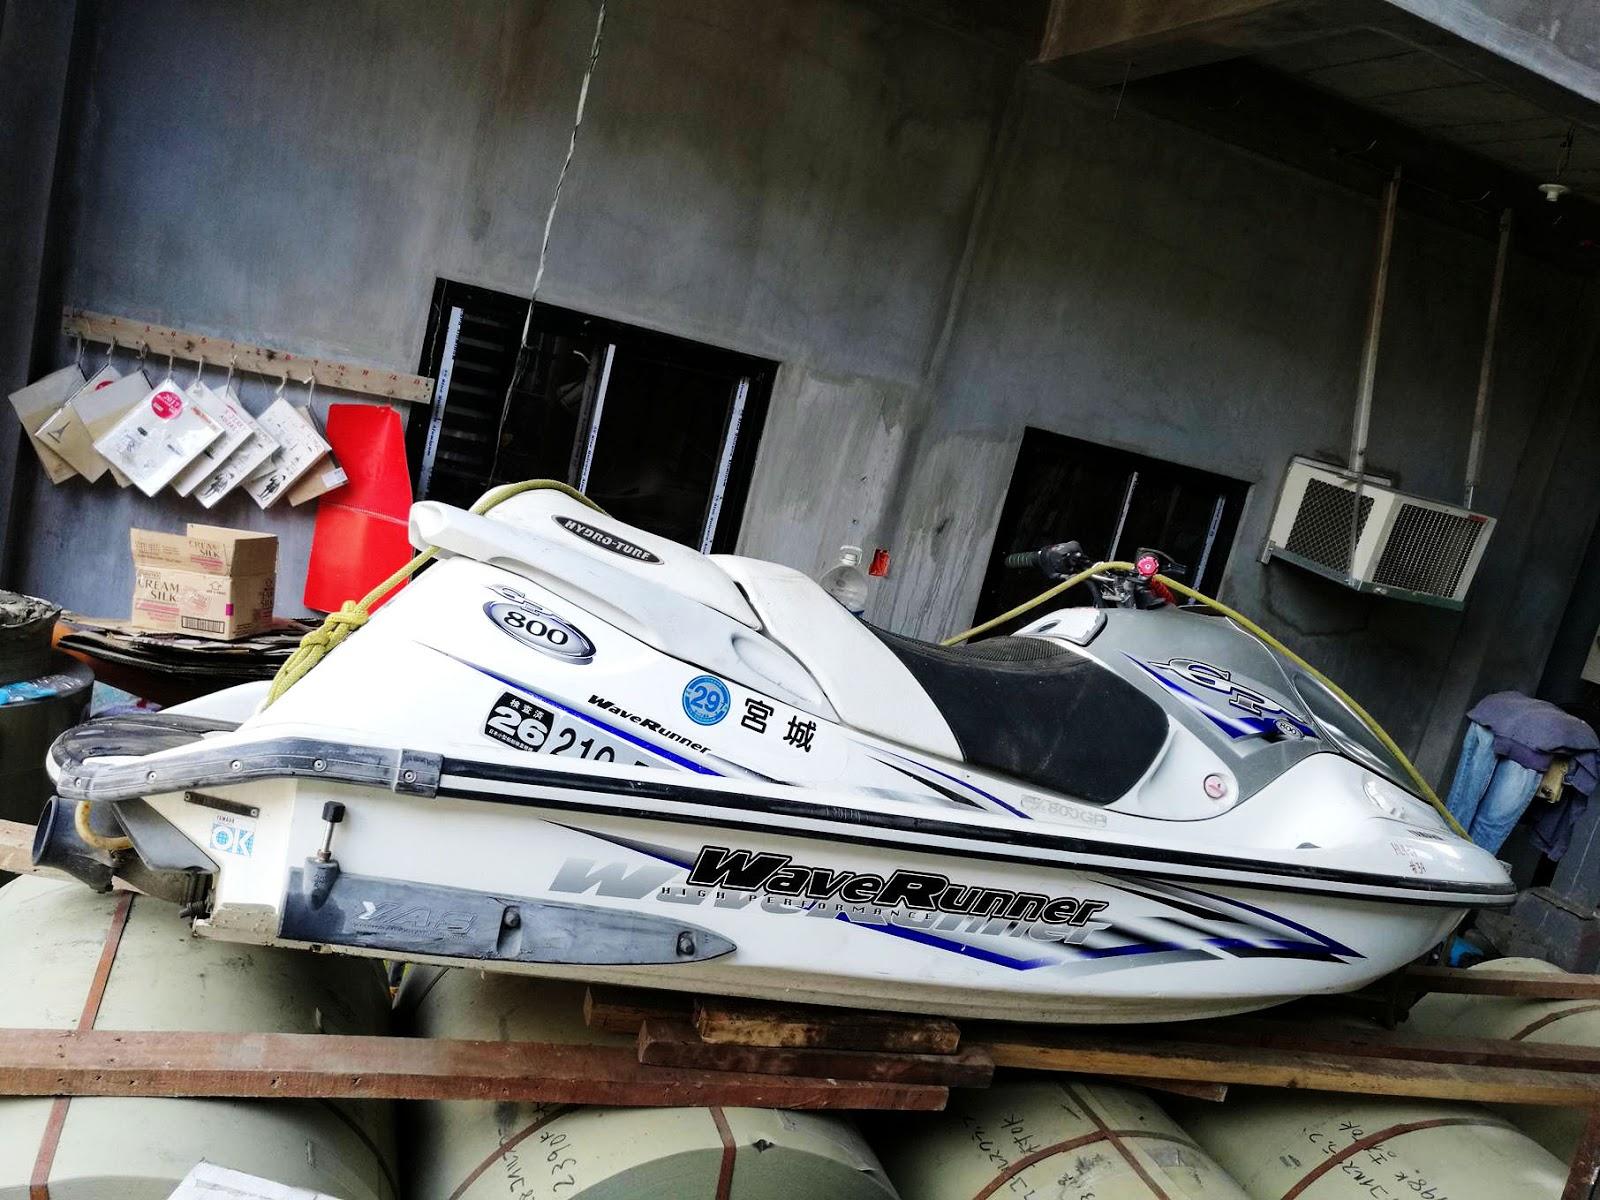 Products jet ski yamaha gp800 wave runner for Jet ski prices yamaha